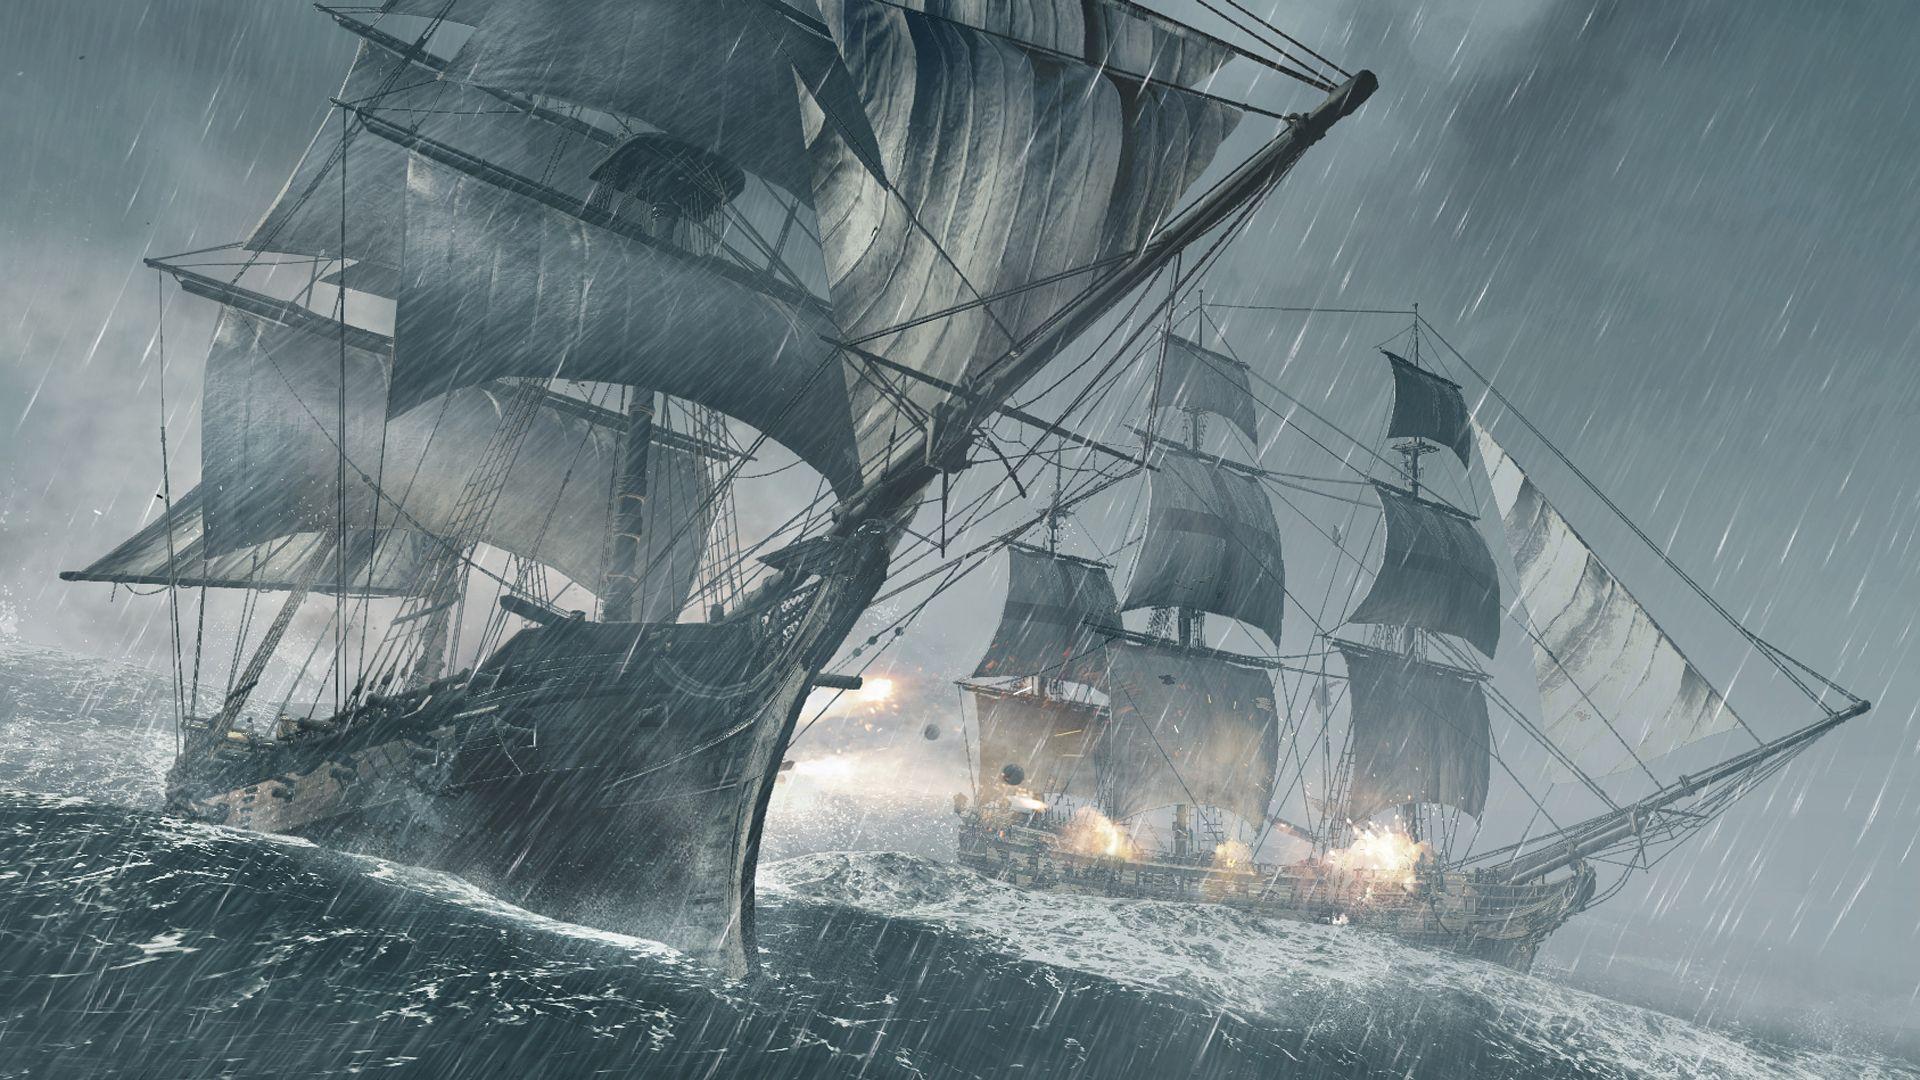 Assassin Creed Iv Game Play Wallpaper Wallpaper Assassins Creed